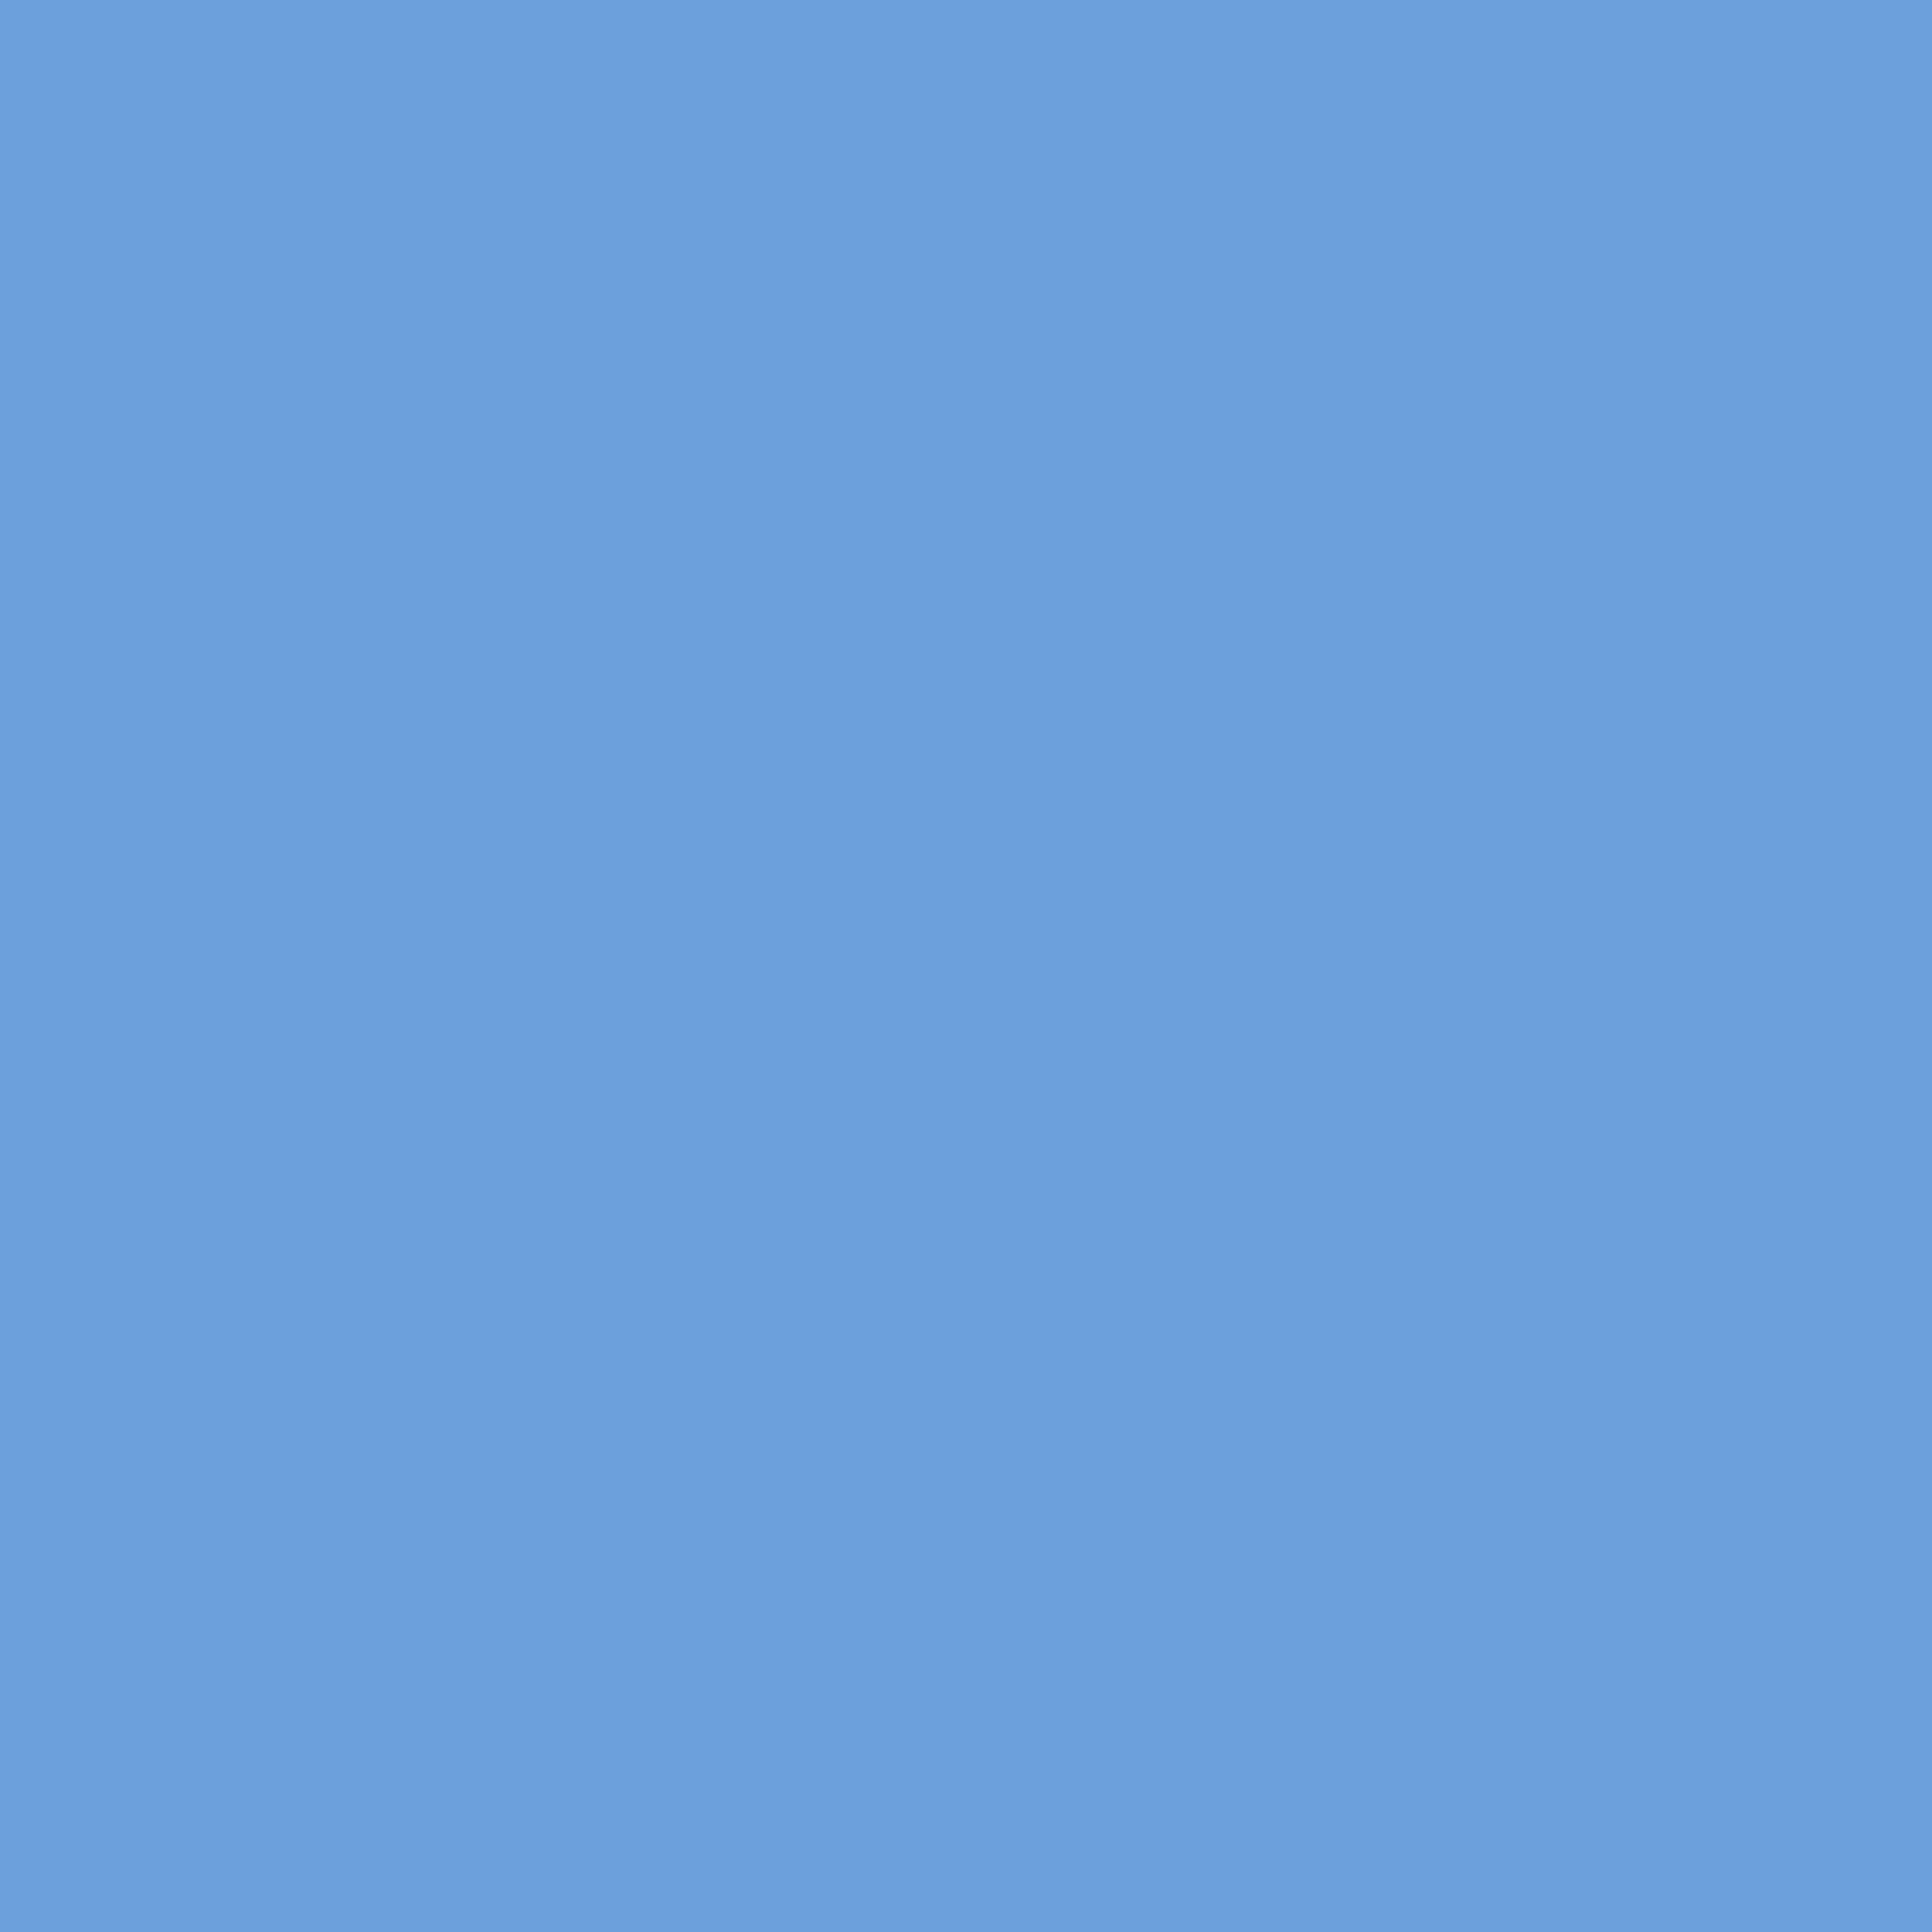 2048x2048 Little Boy Blue Solid Color Background